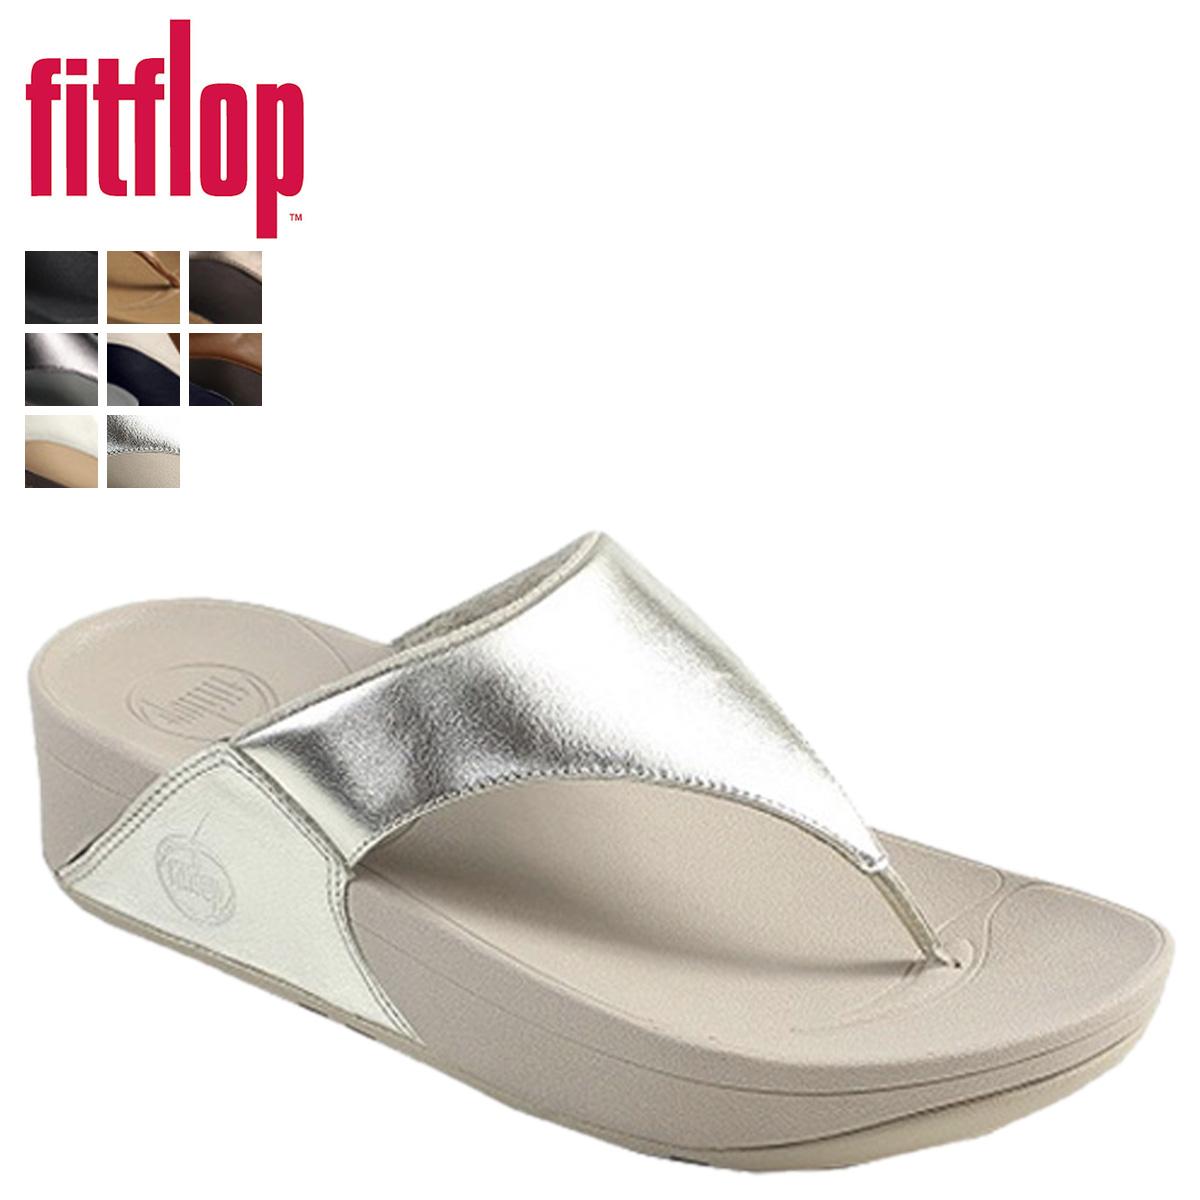 2c5e22ac8 FitFlop fit flop Lulu Sandals 288-001 288-010 288-017 288-054 288-194 LULU  Leather Womens